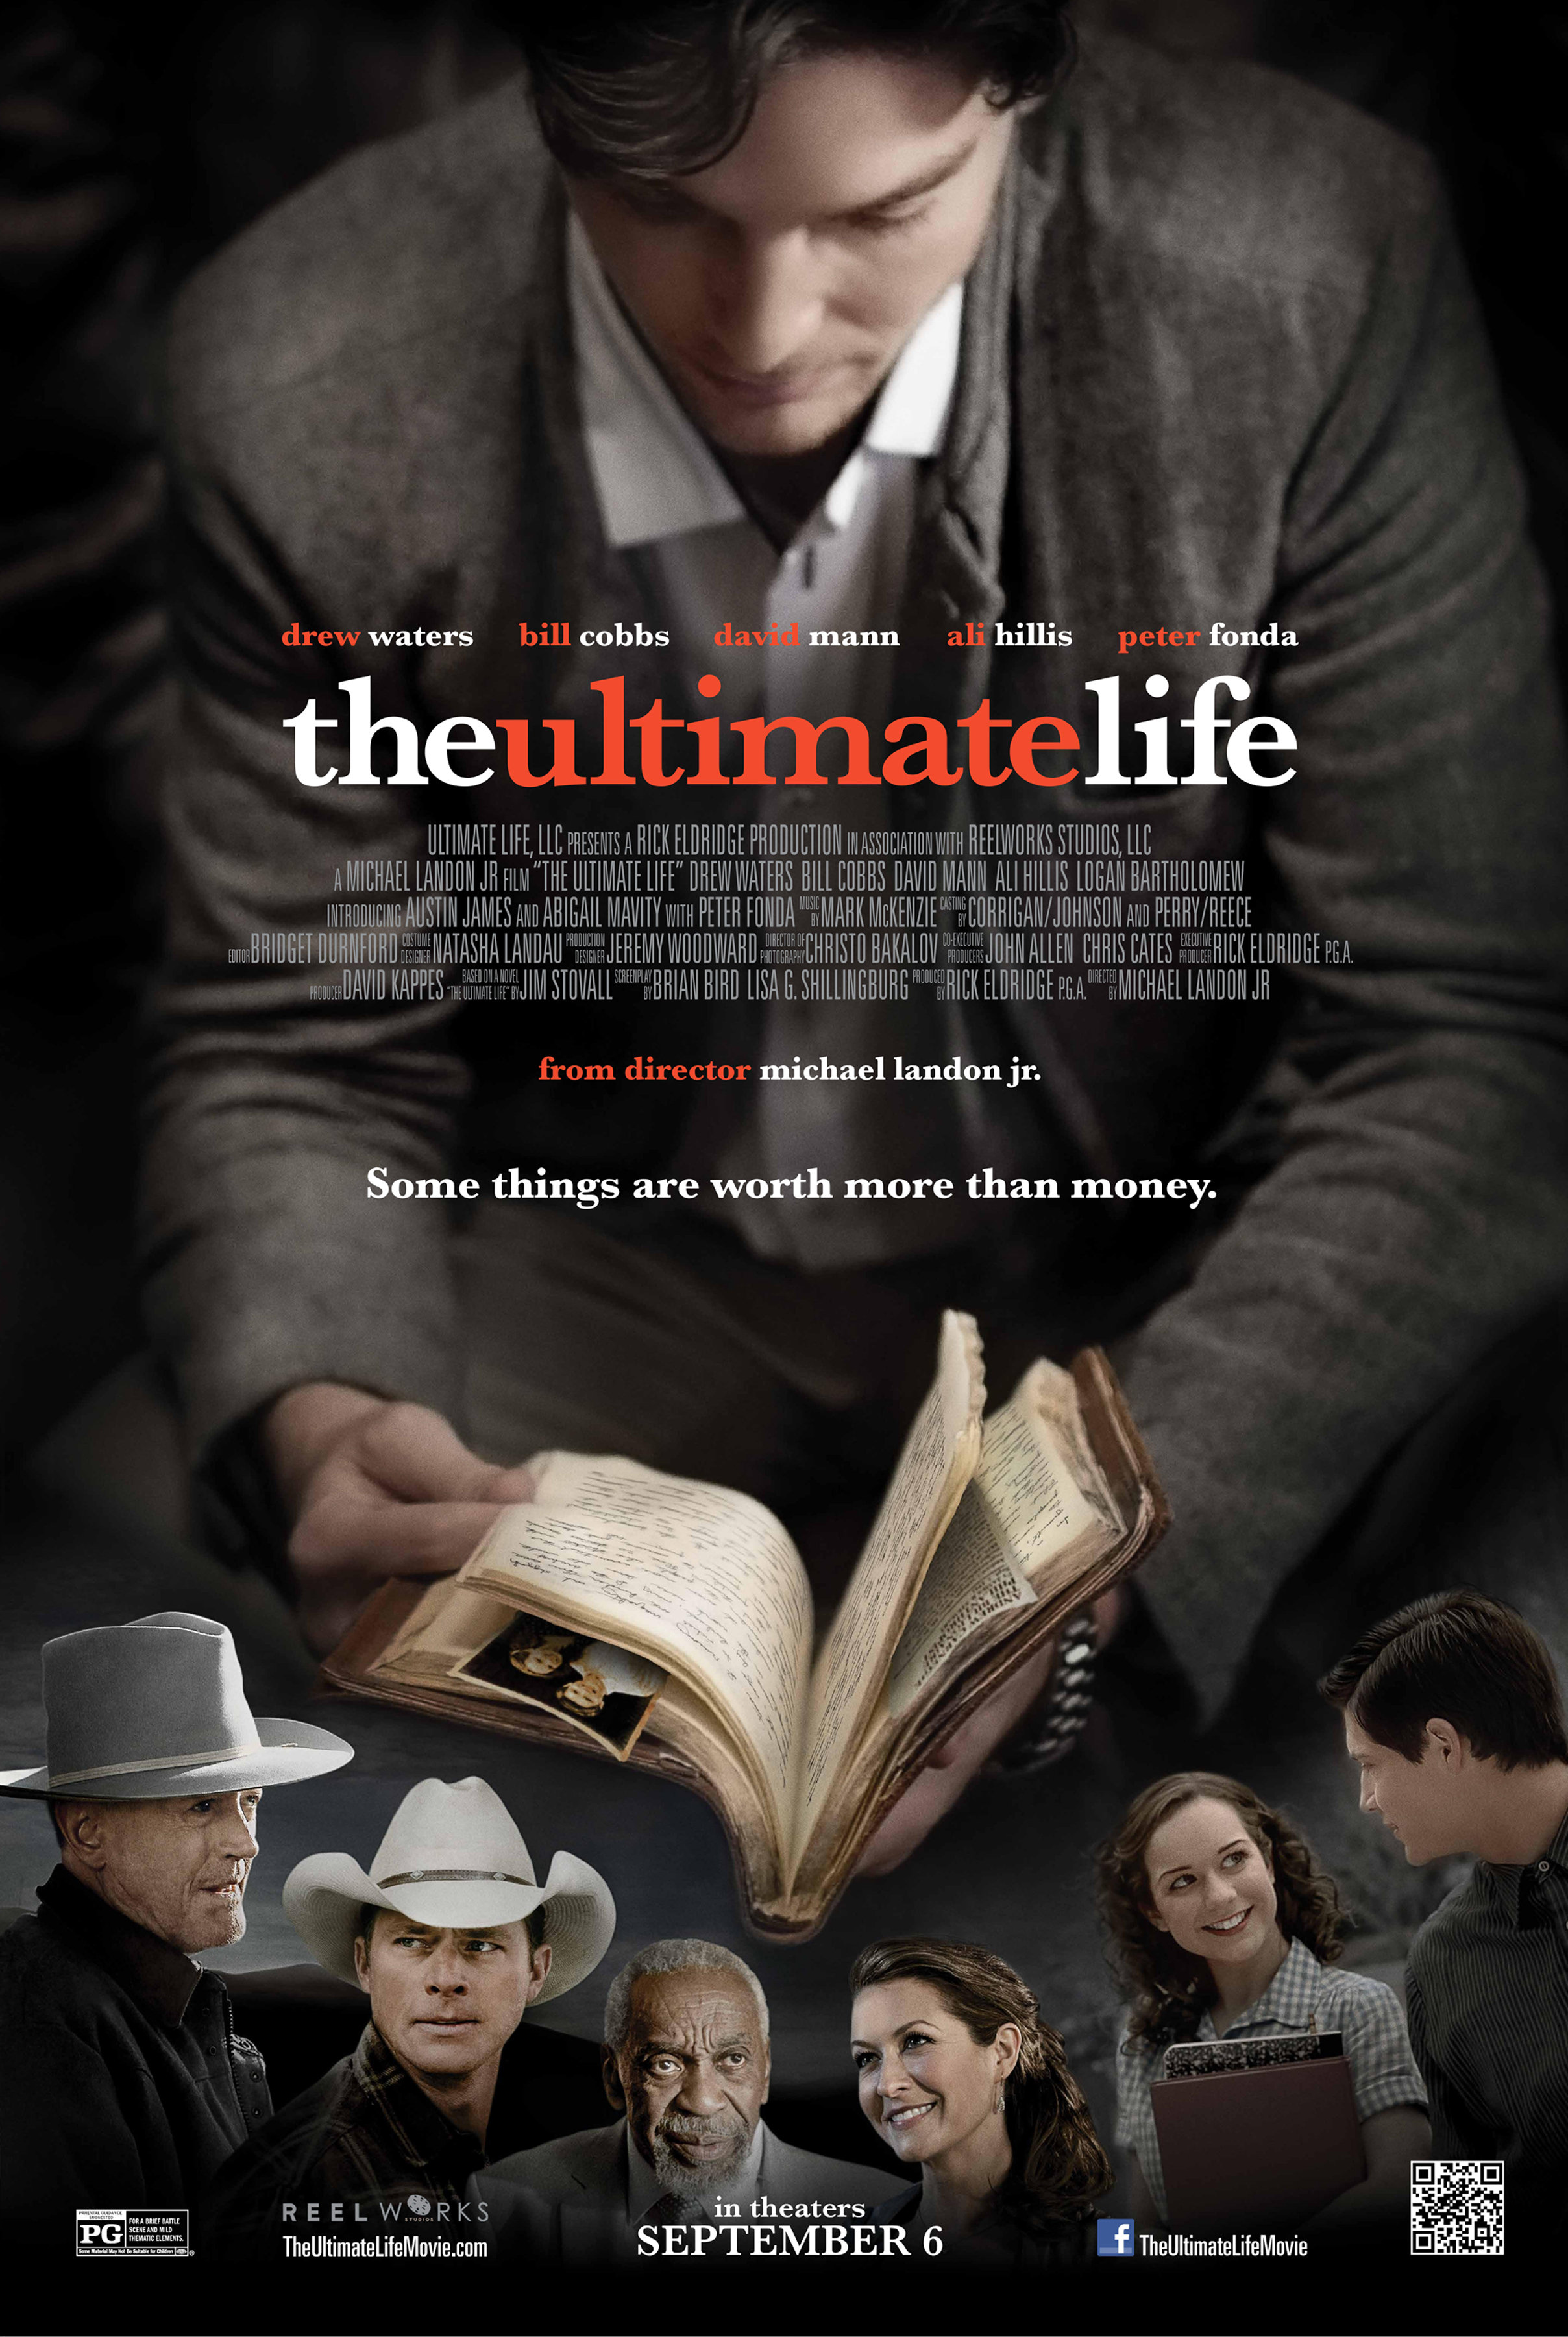 The Ultimate Life 2013 Imdb